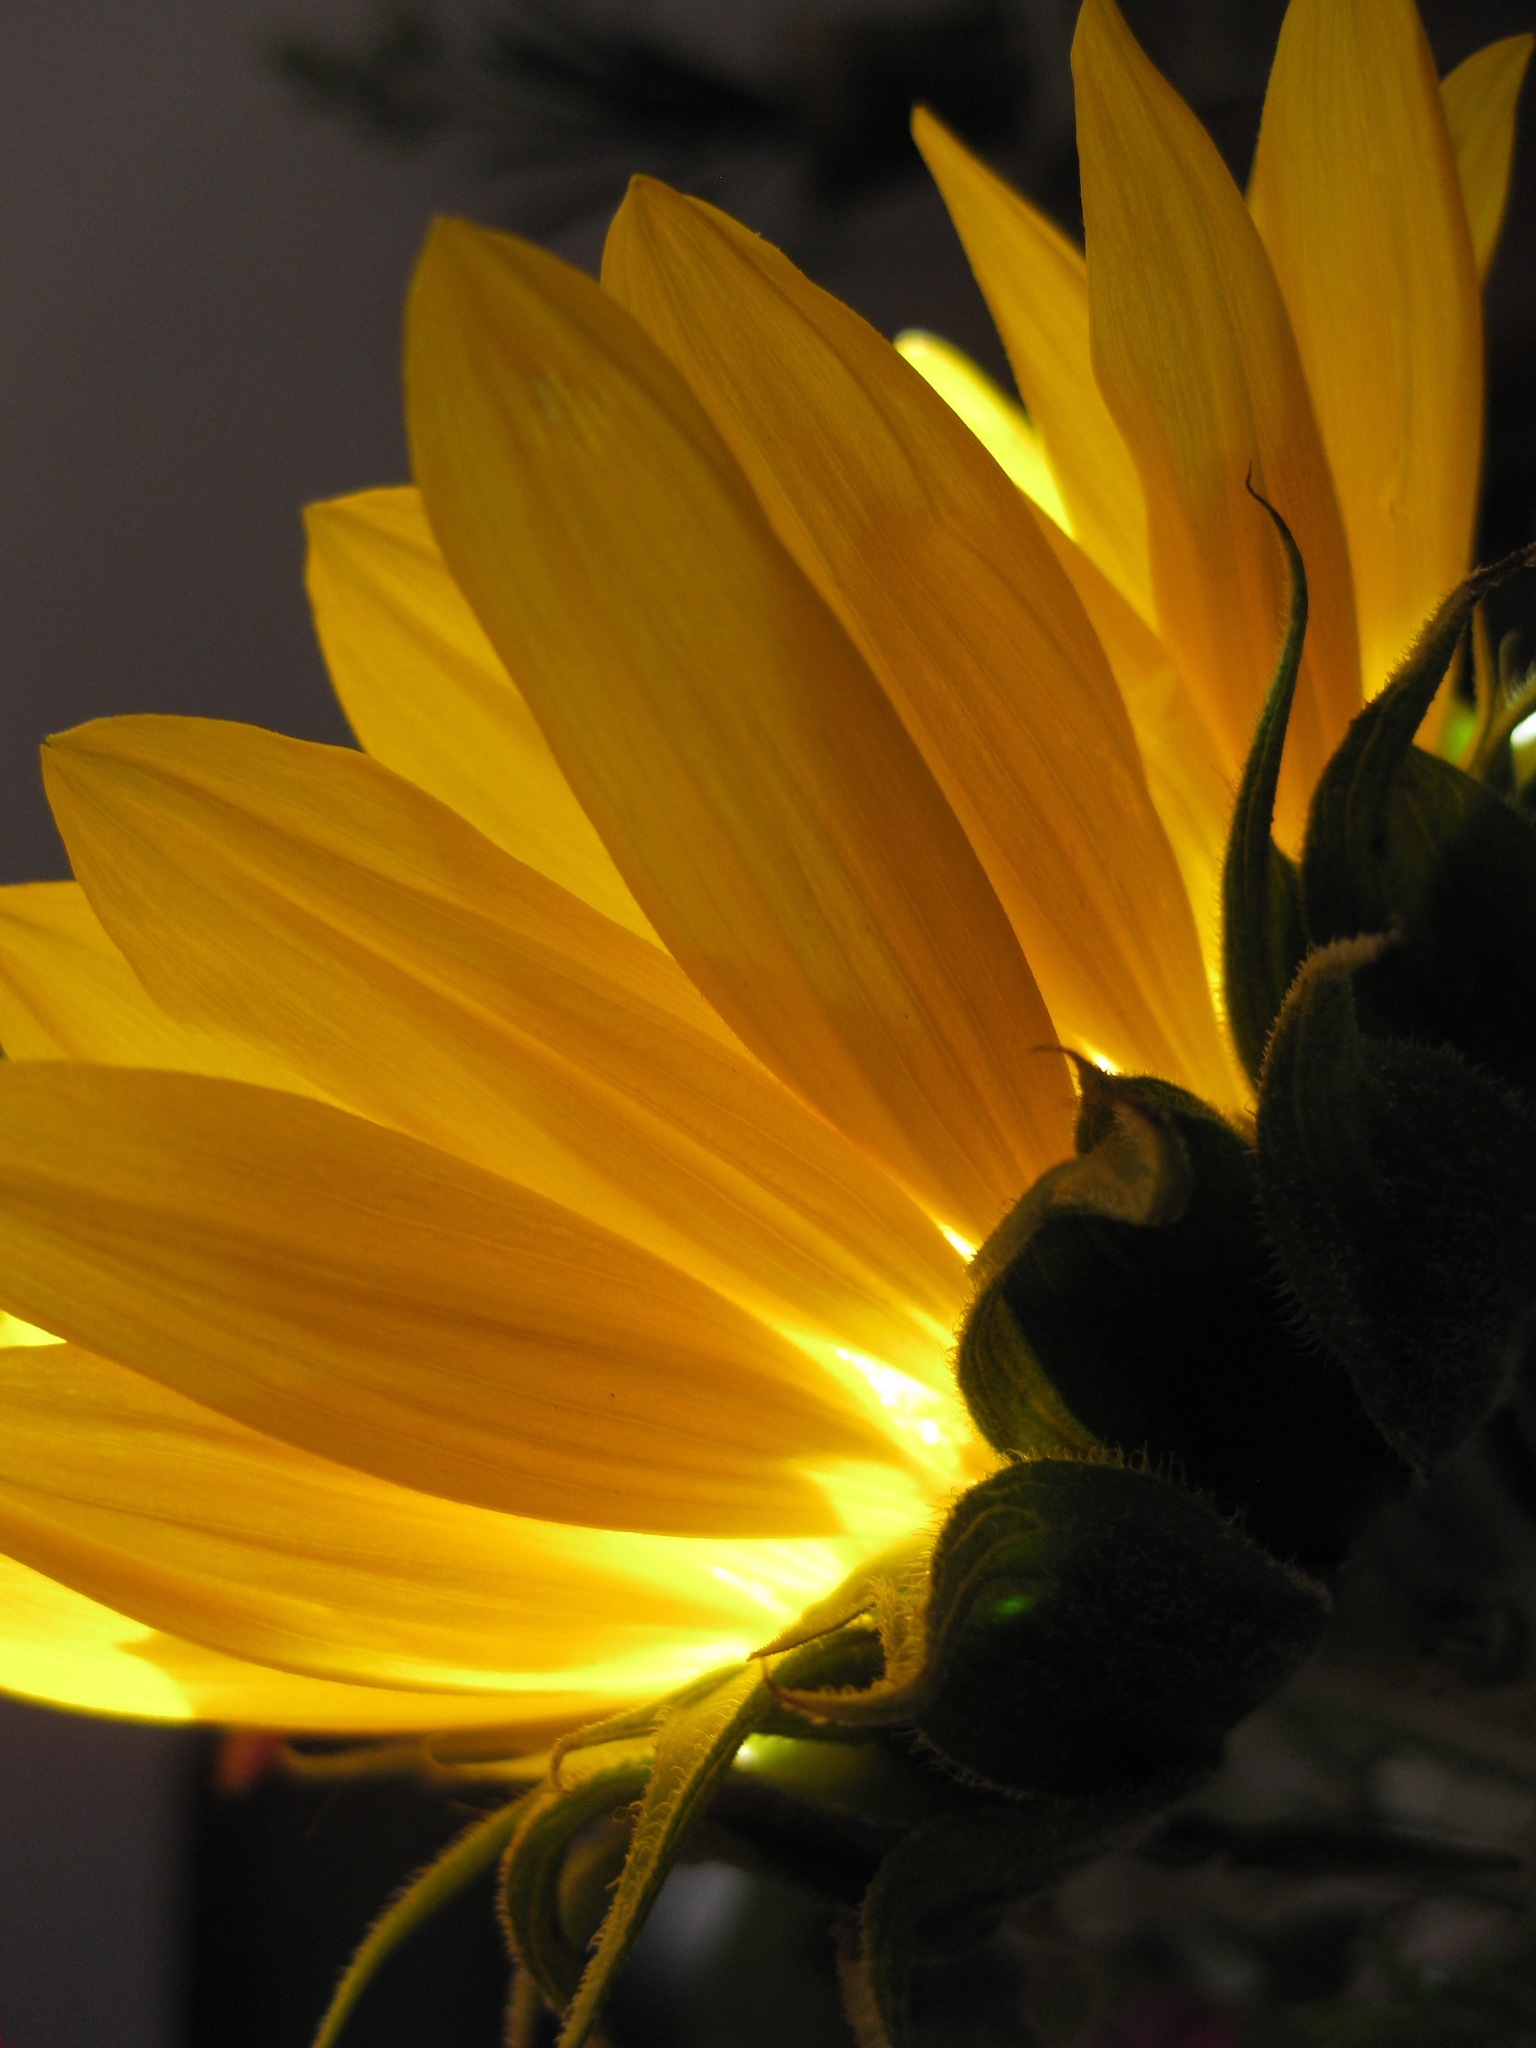 Sunflower by Constance Festo Lafond